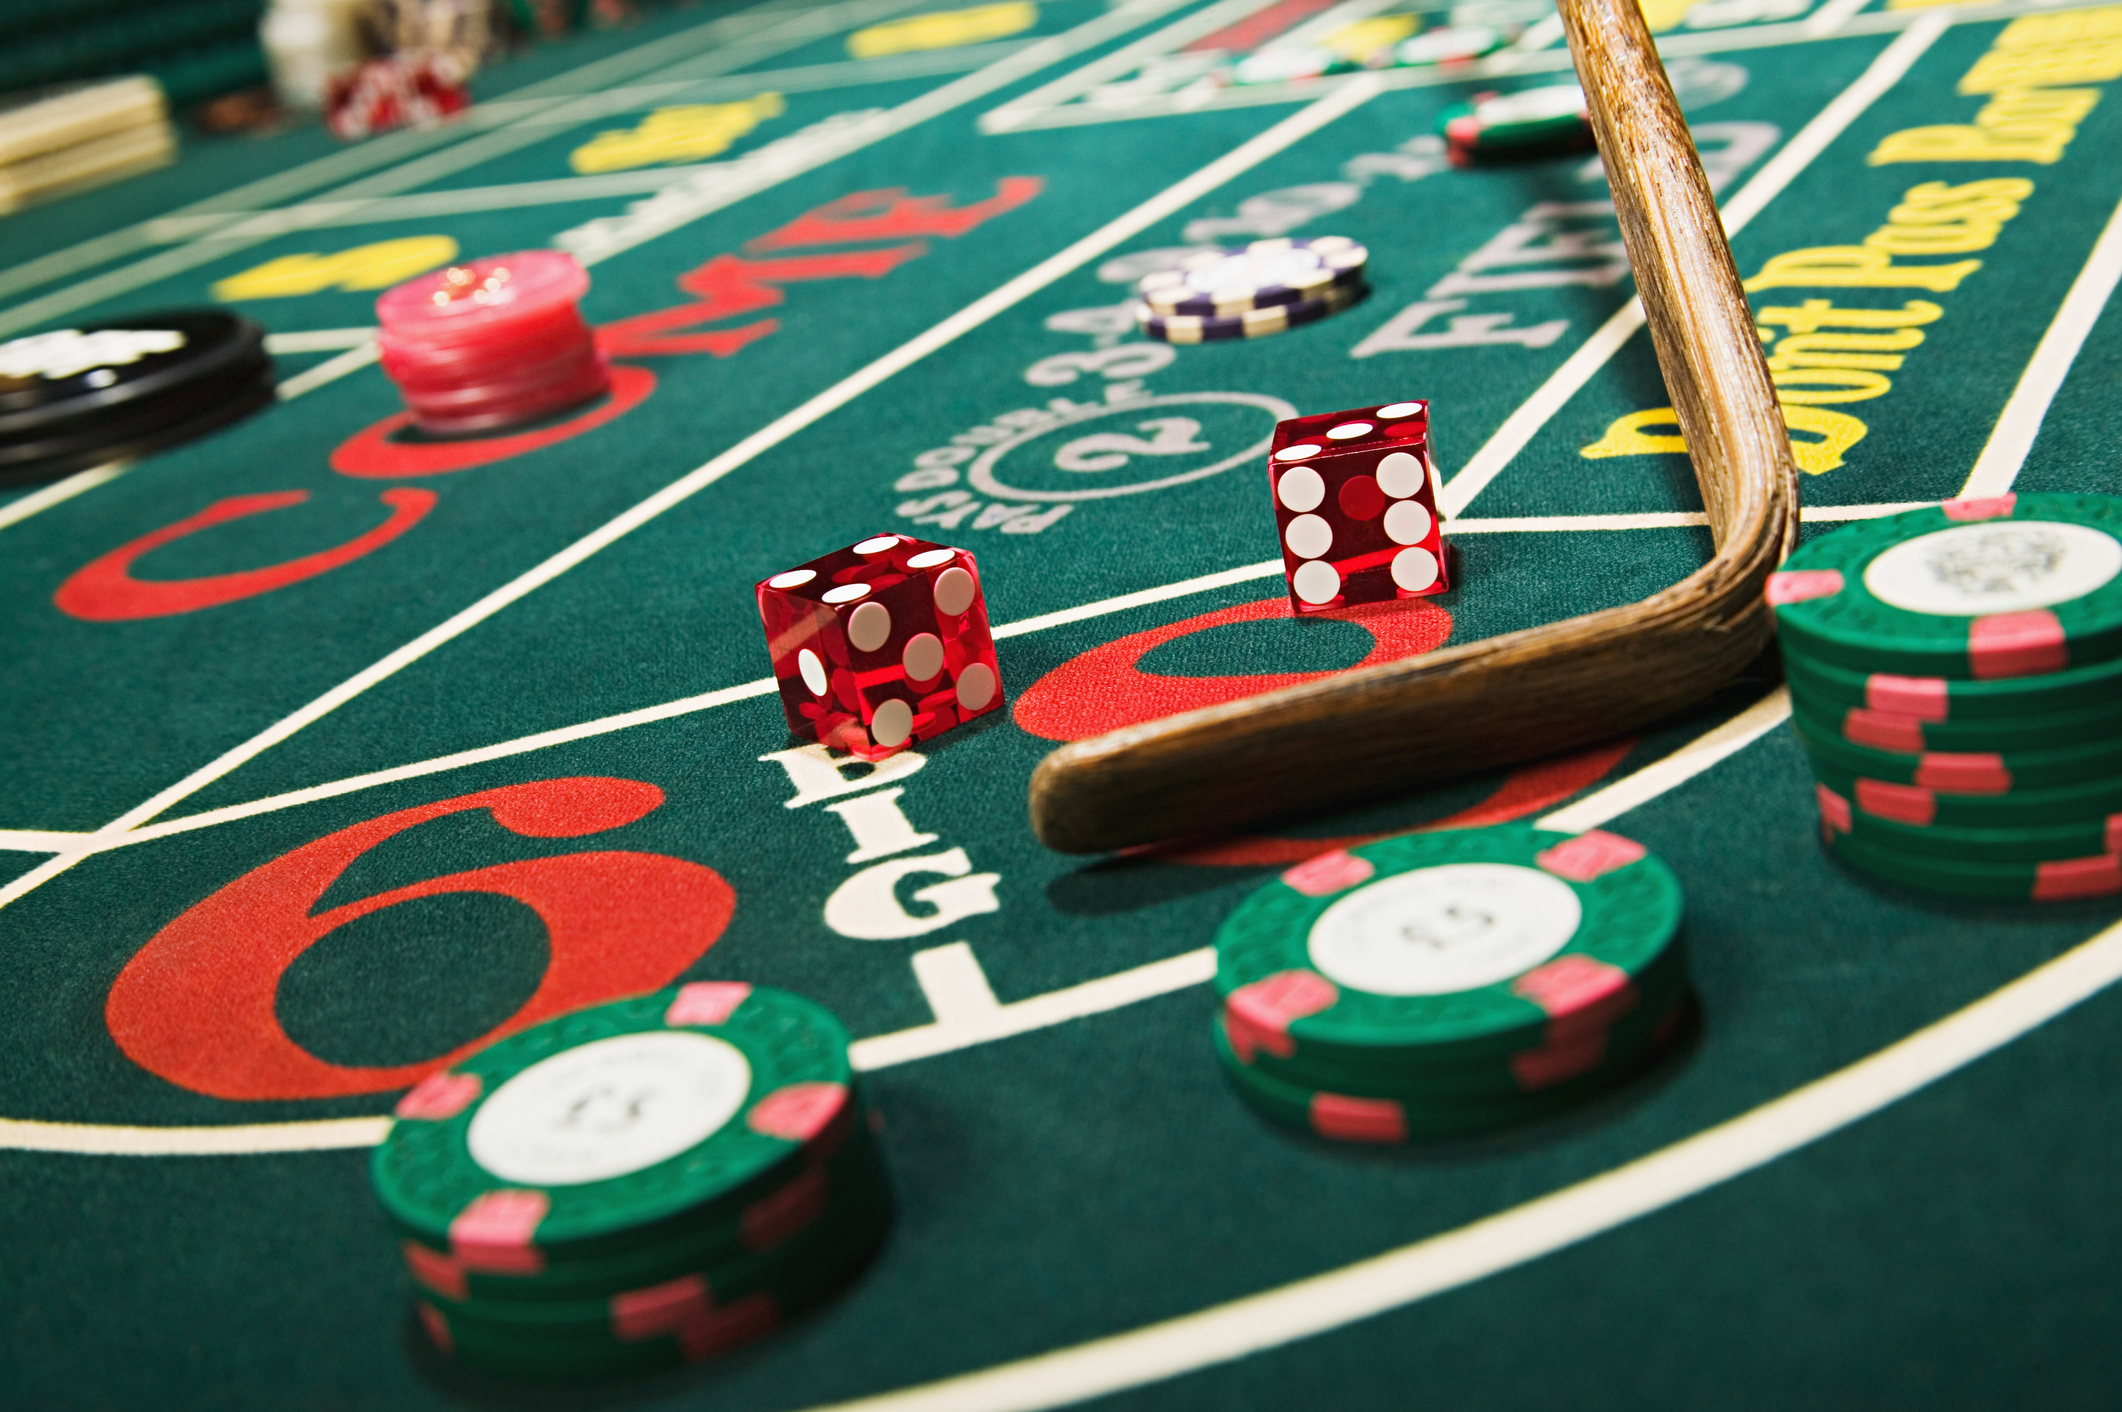 Gambling bill passes Alabama Senate committee | WRBL